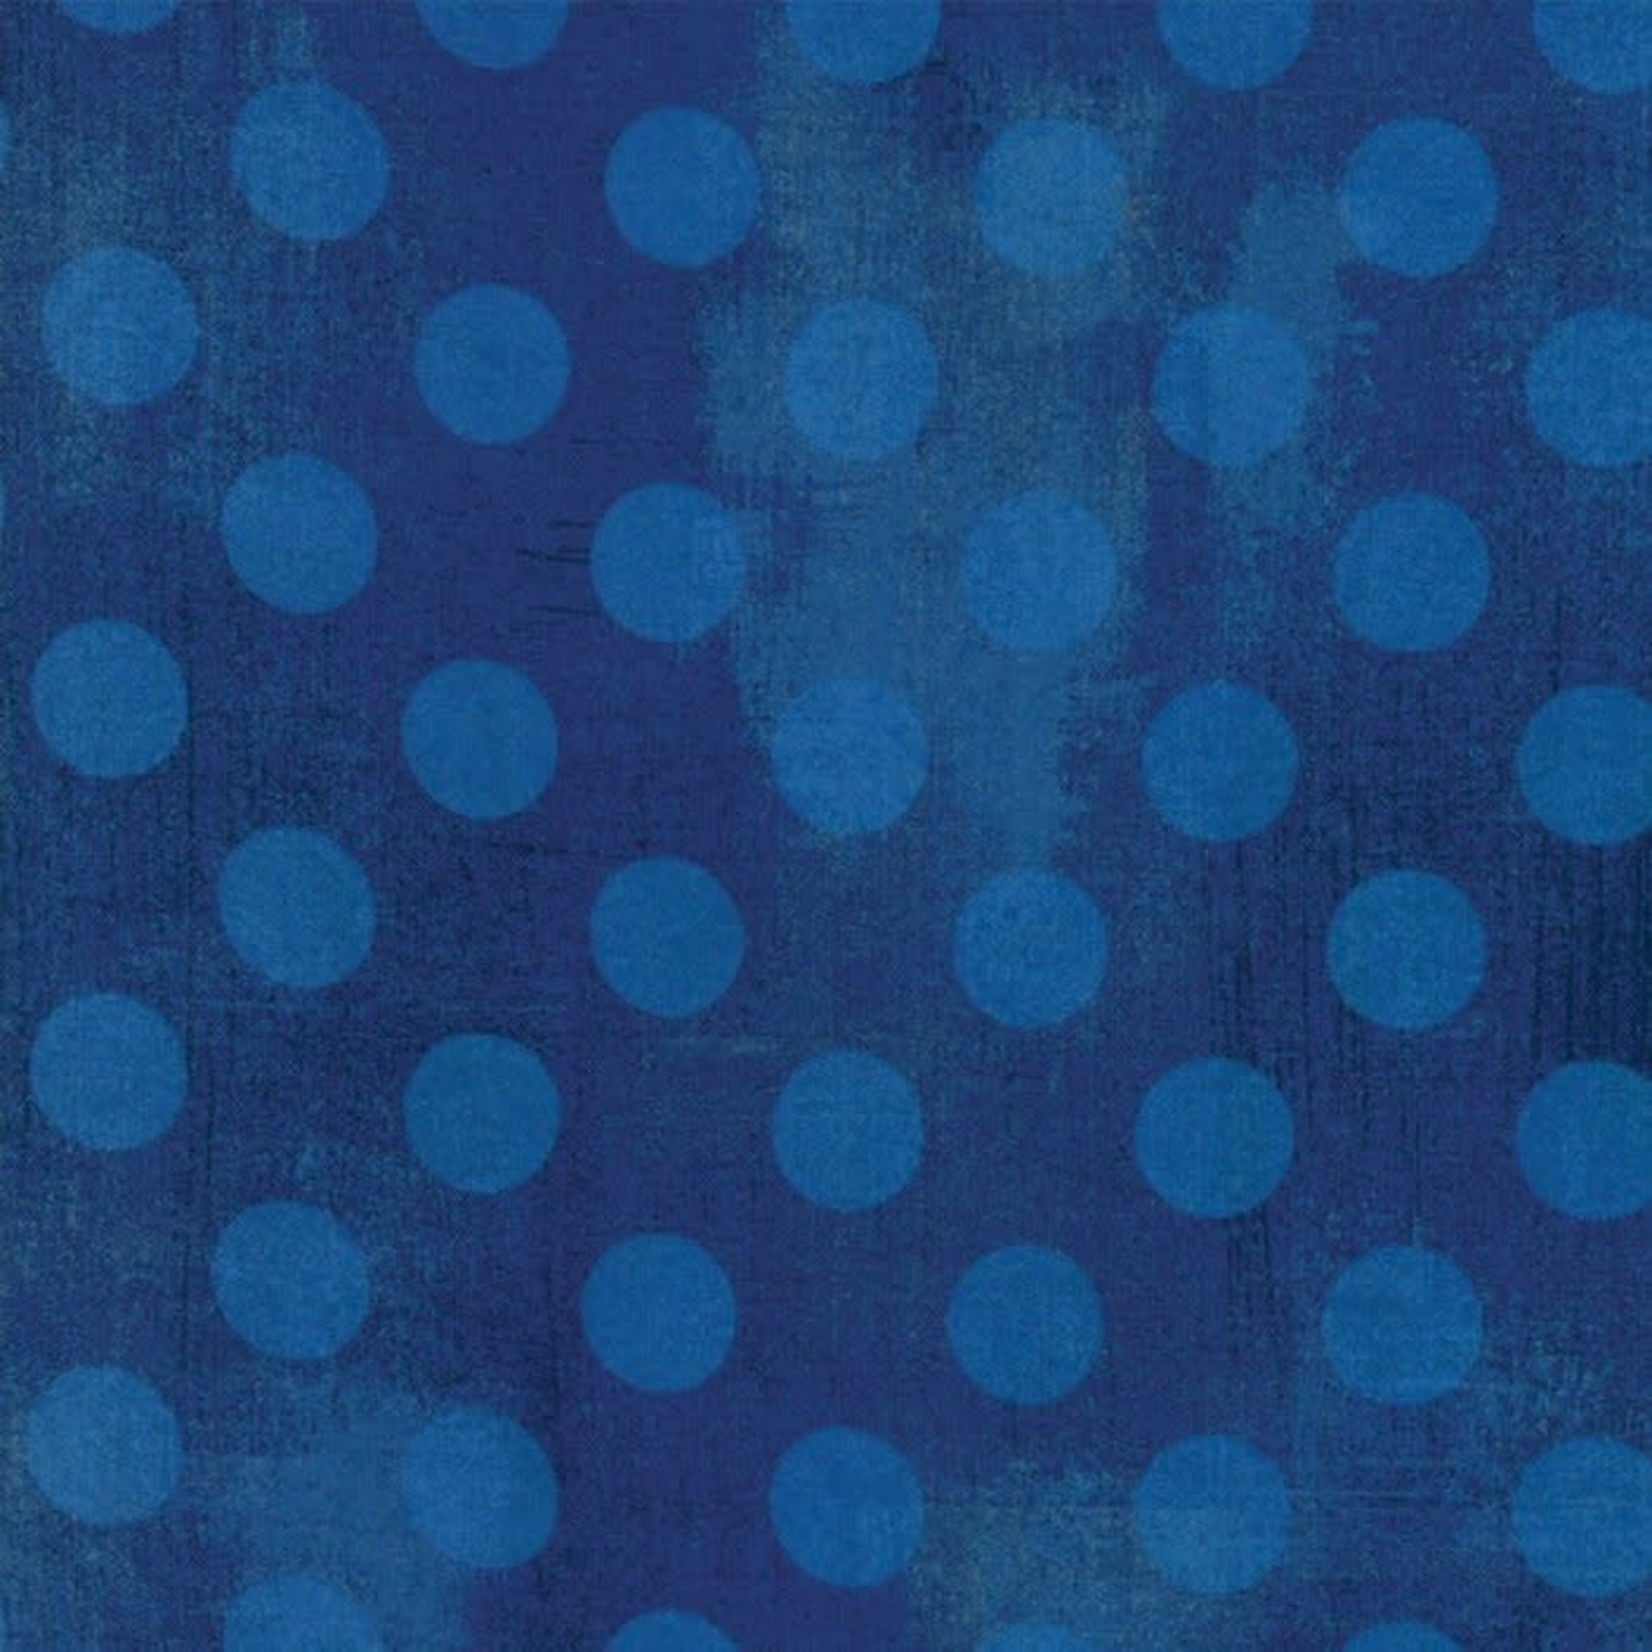 Moda BasicGray - Grunge - Hits The Spot - Cobalt